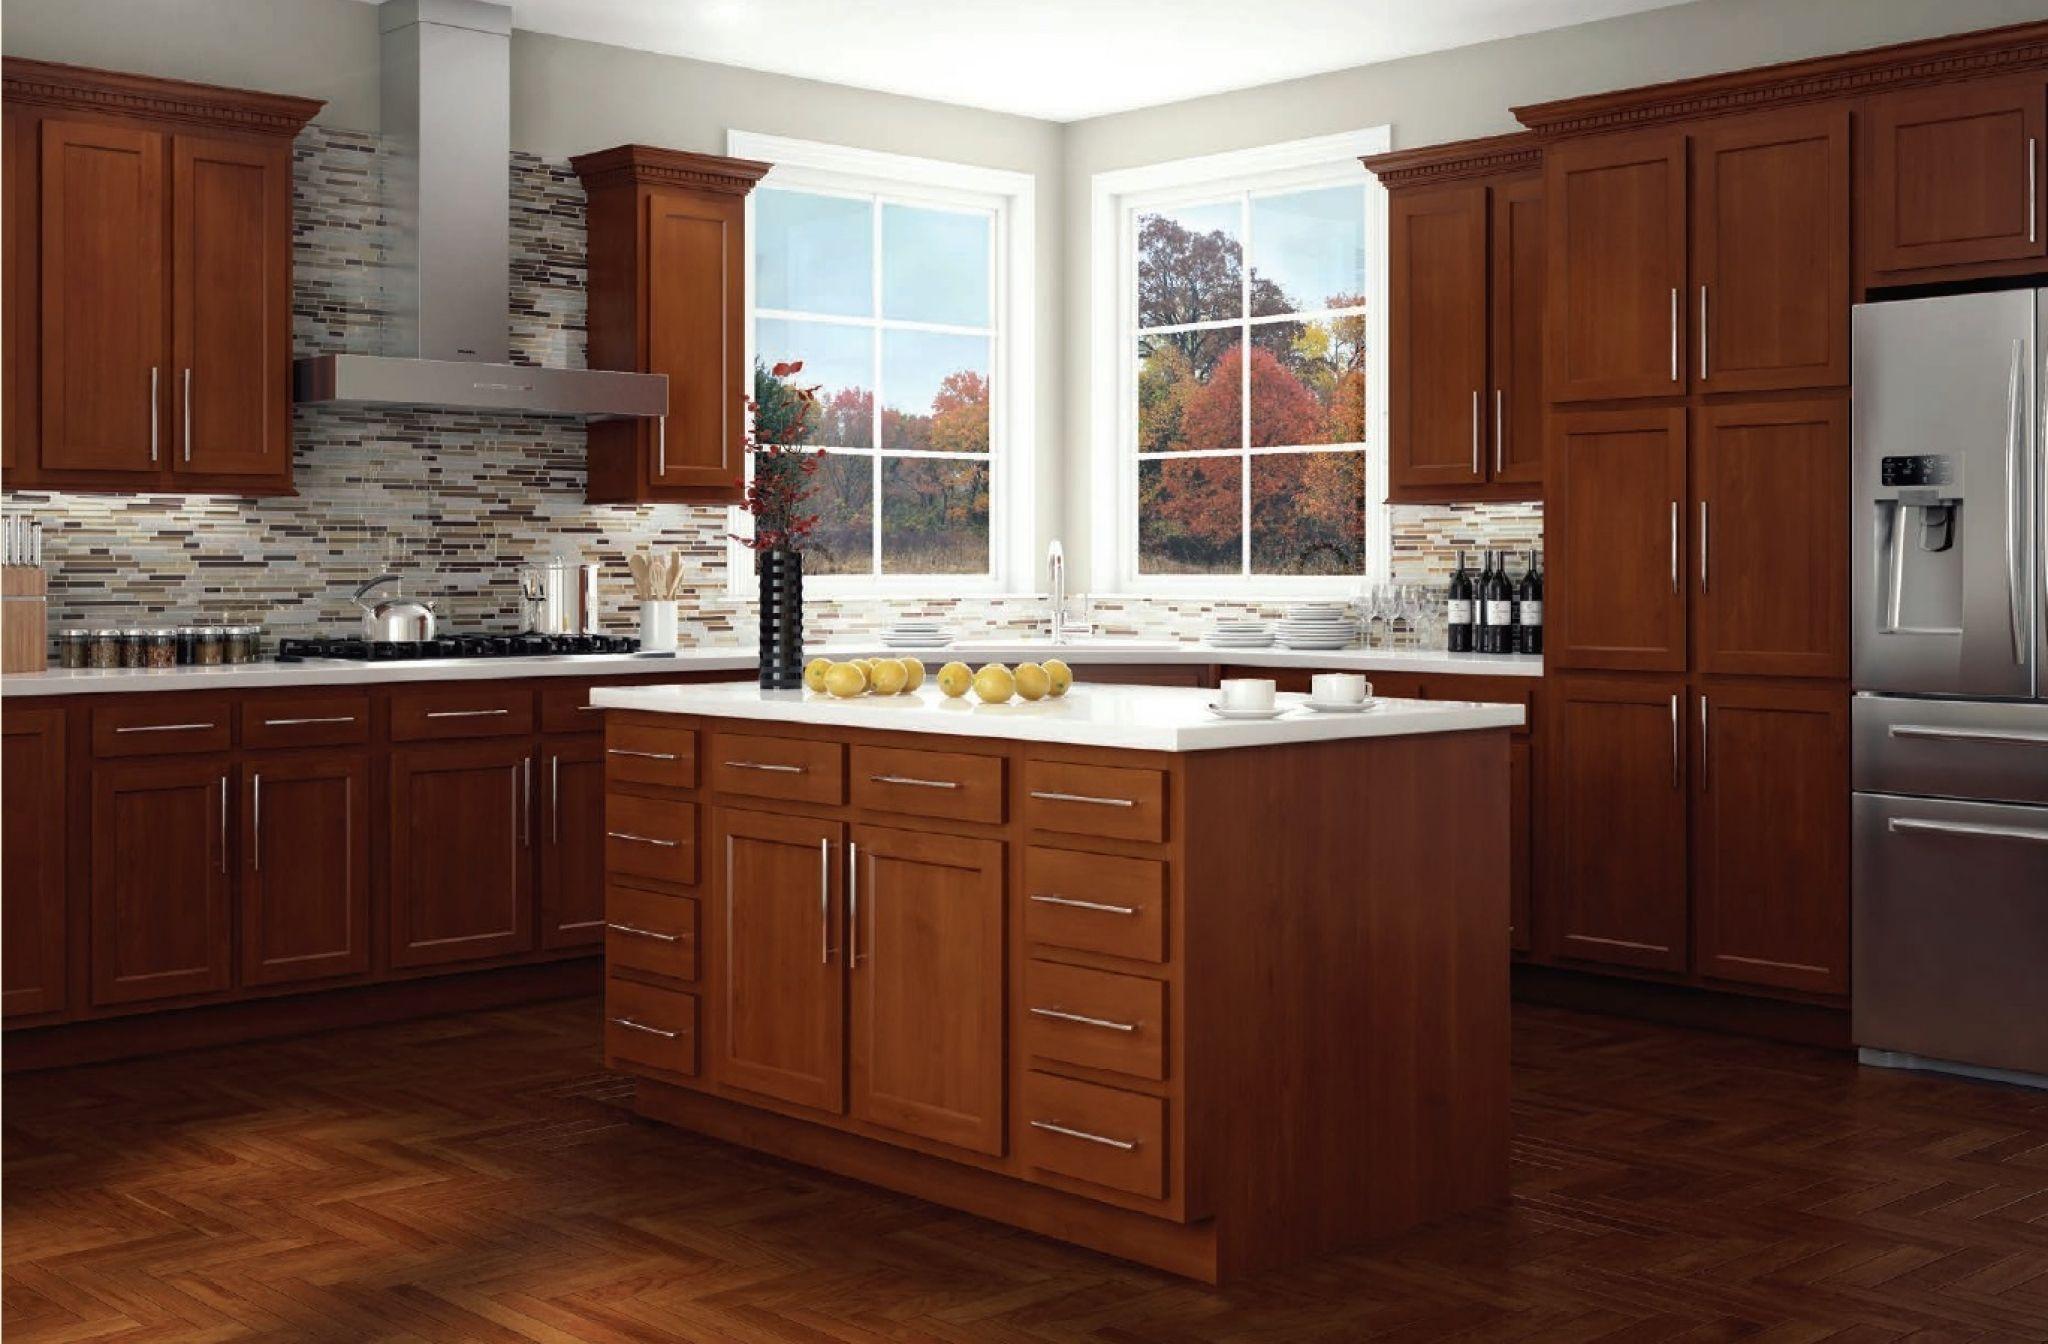 pin by kitchen cabinets on kitchen cabinets | pinterest | kitchen